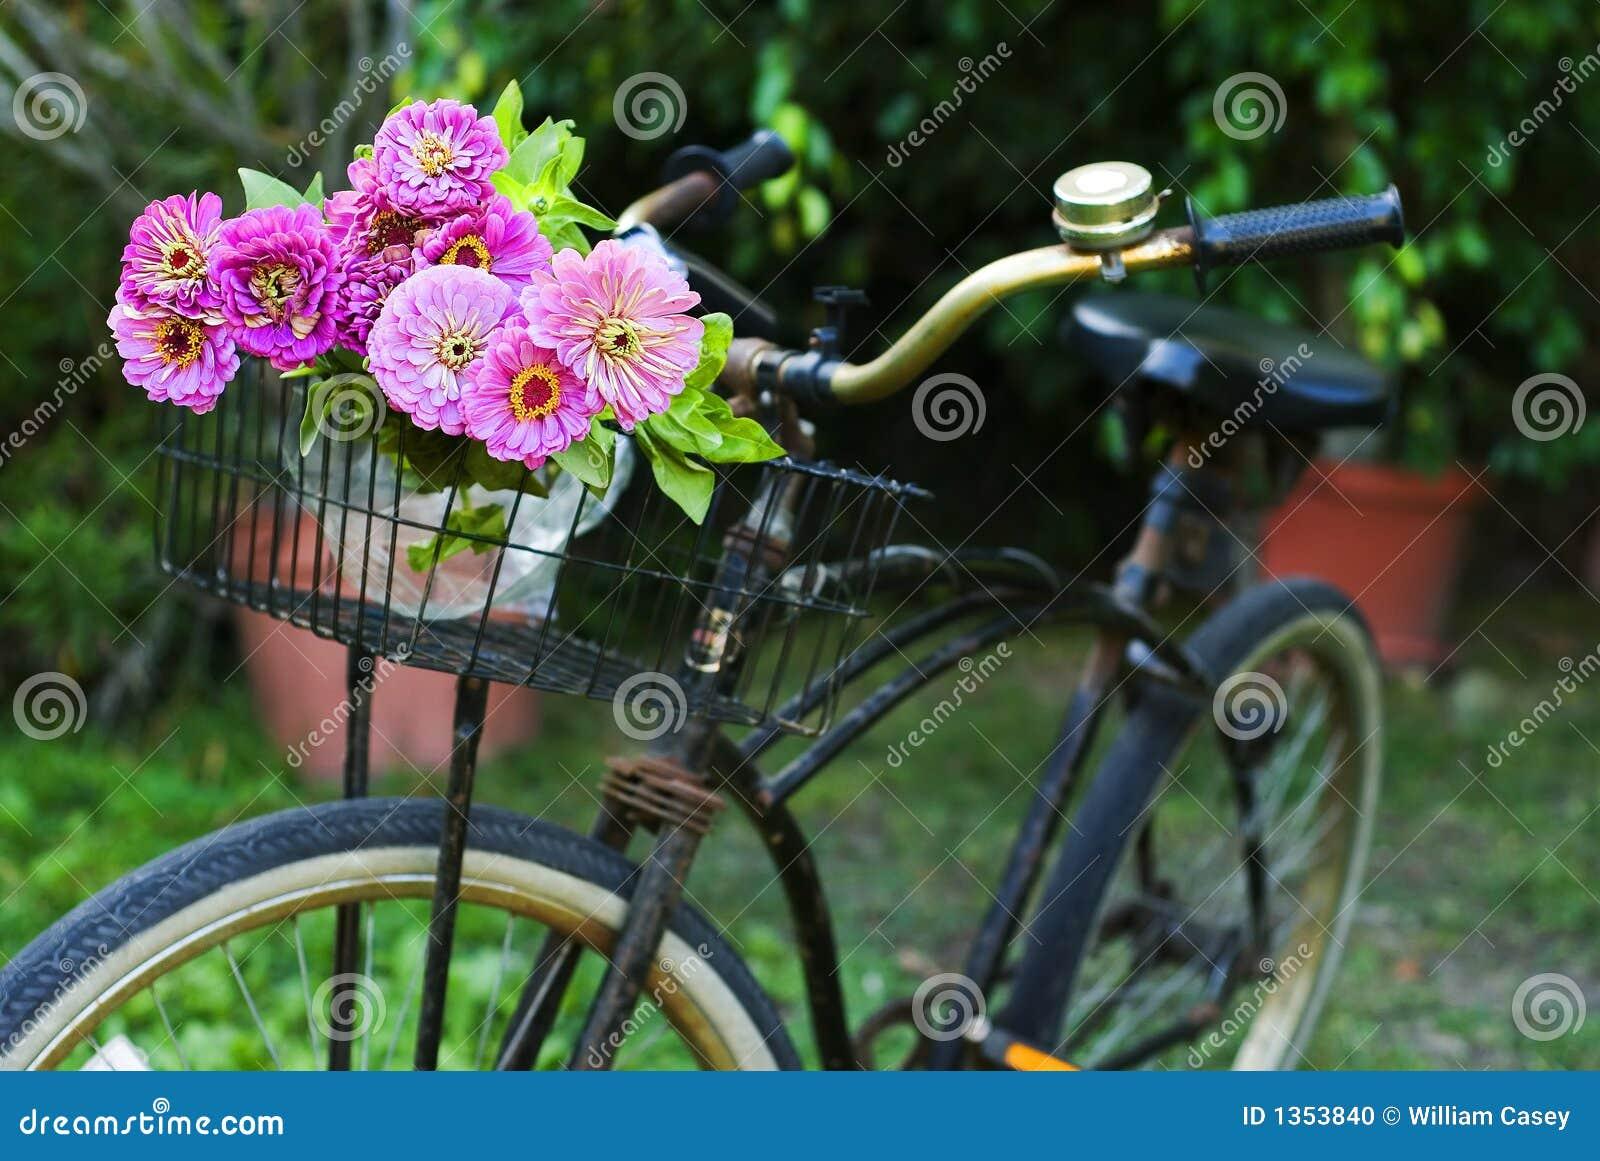 fahrrad mit blumen stockfoto bild 1353840. Black Bedroom Furniture Sets. Home Design Ideas